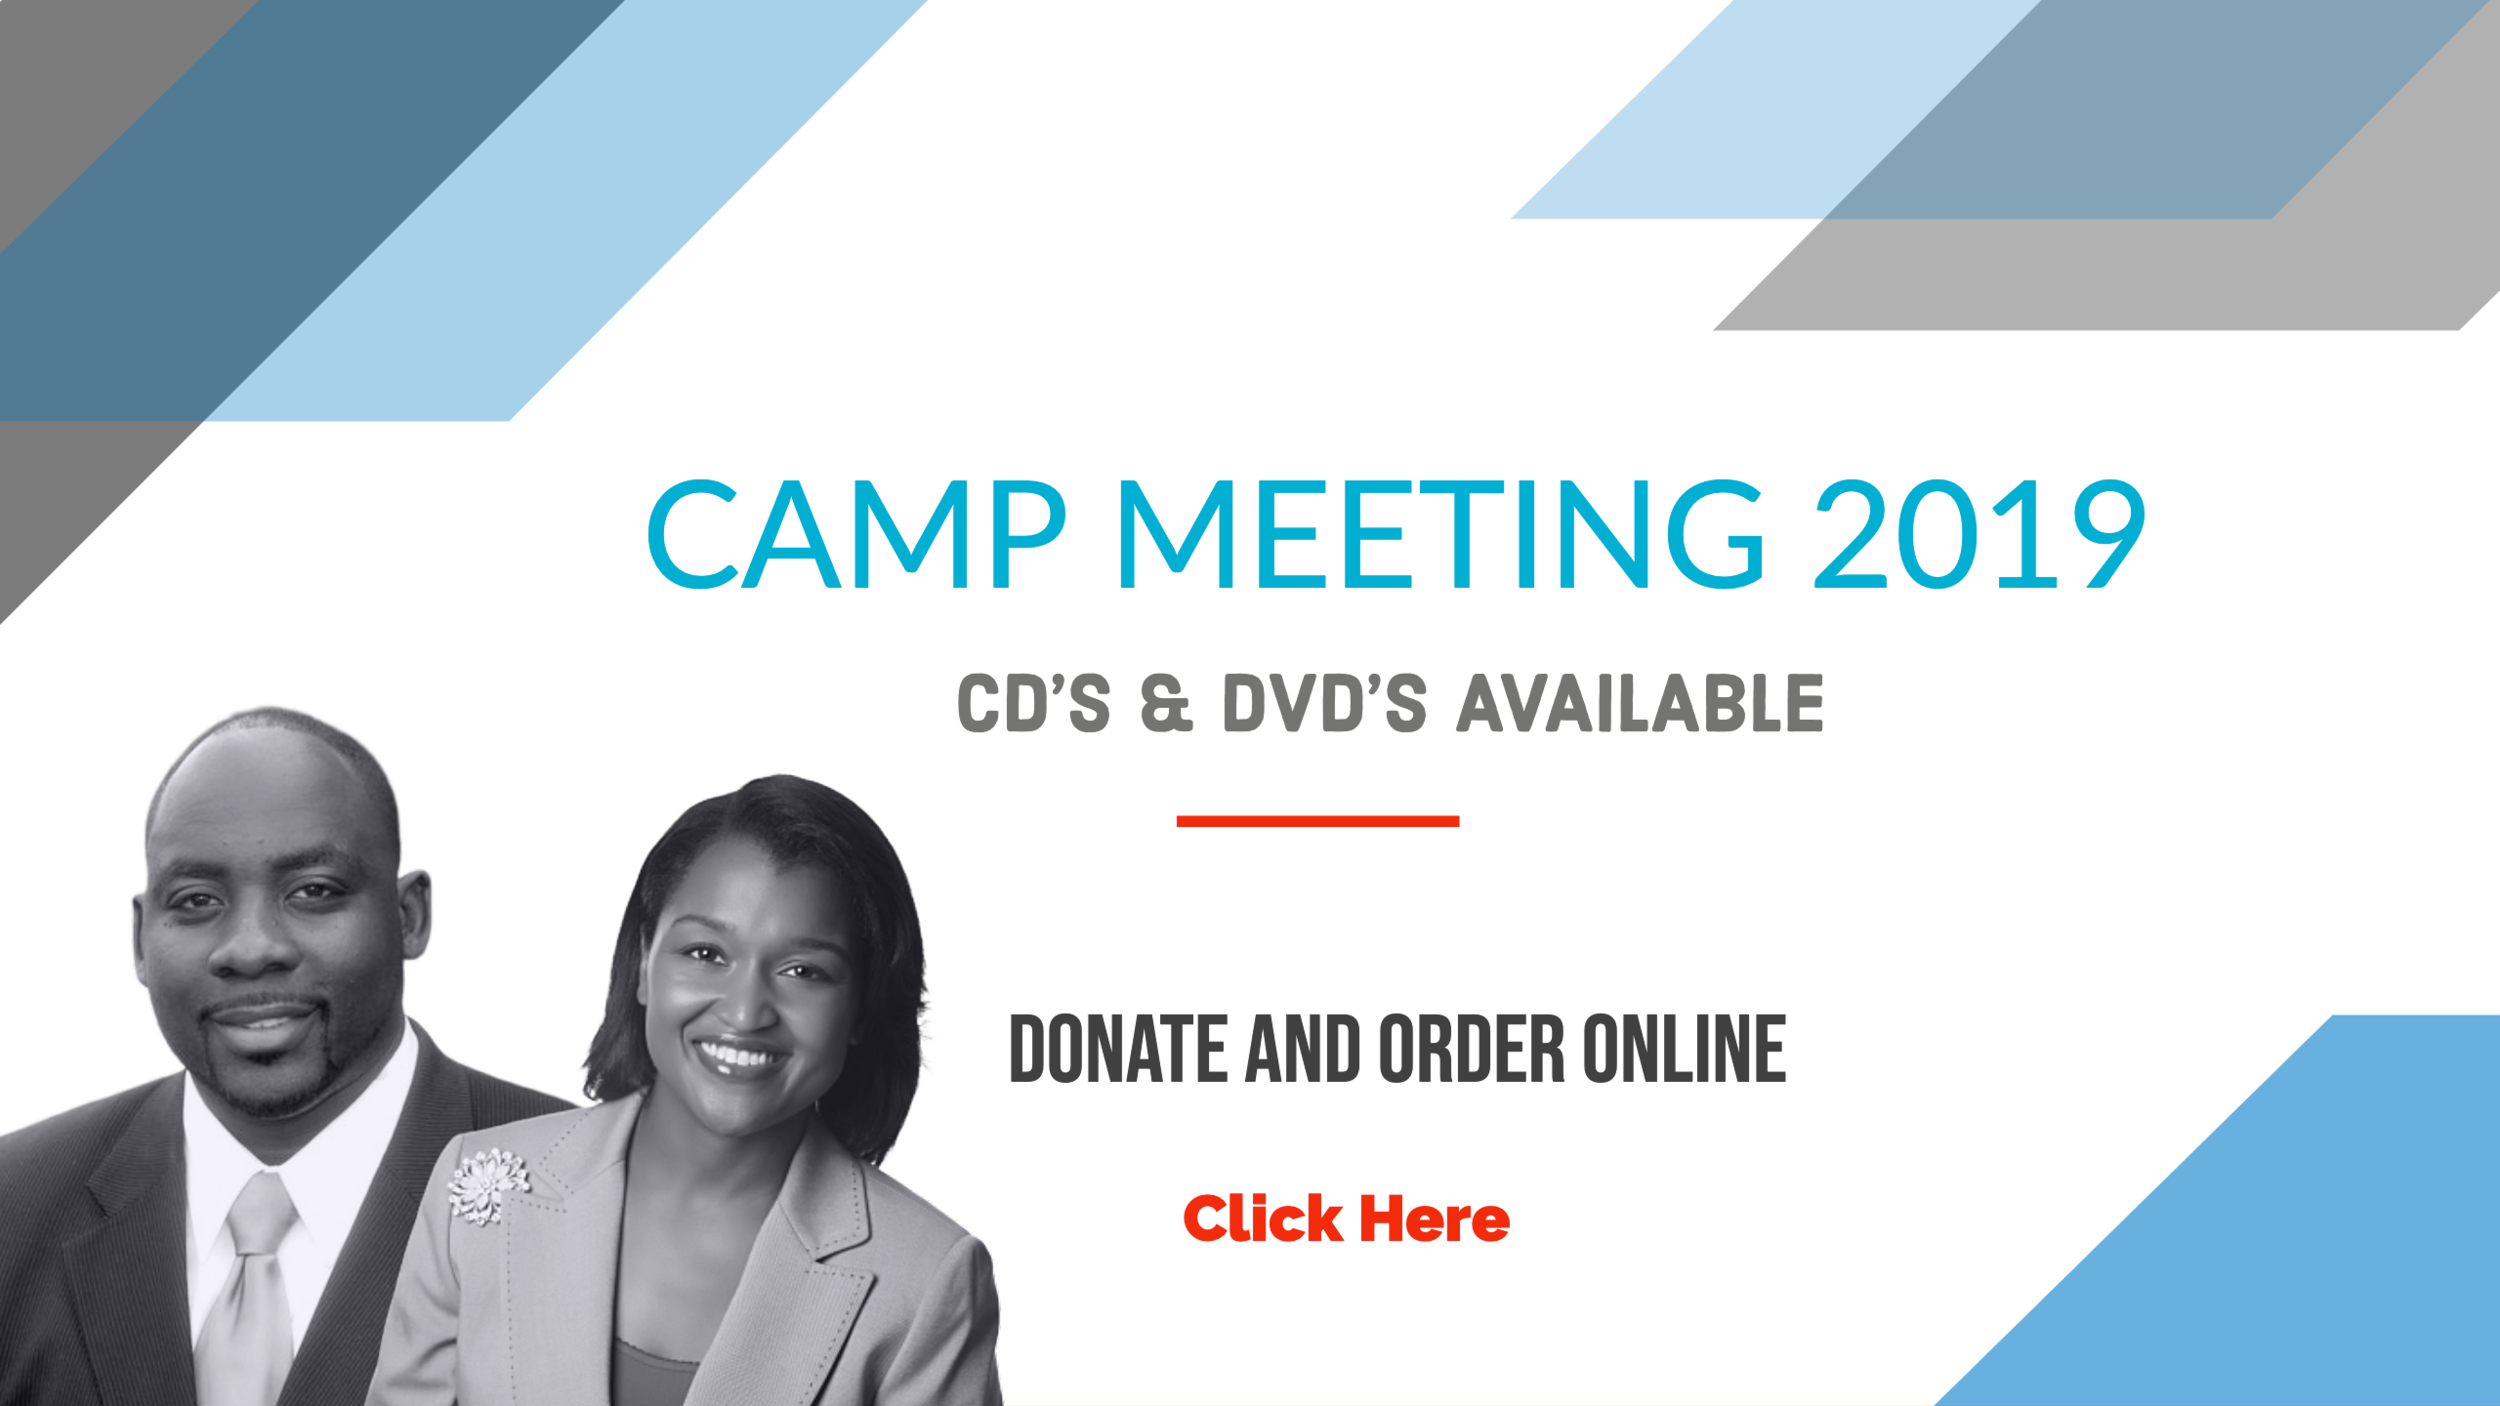 Camp meeting 2019 CD/DVD